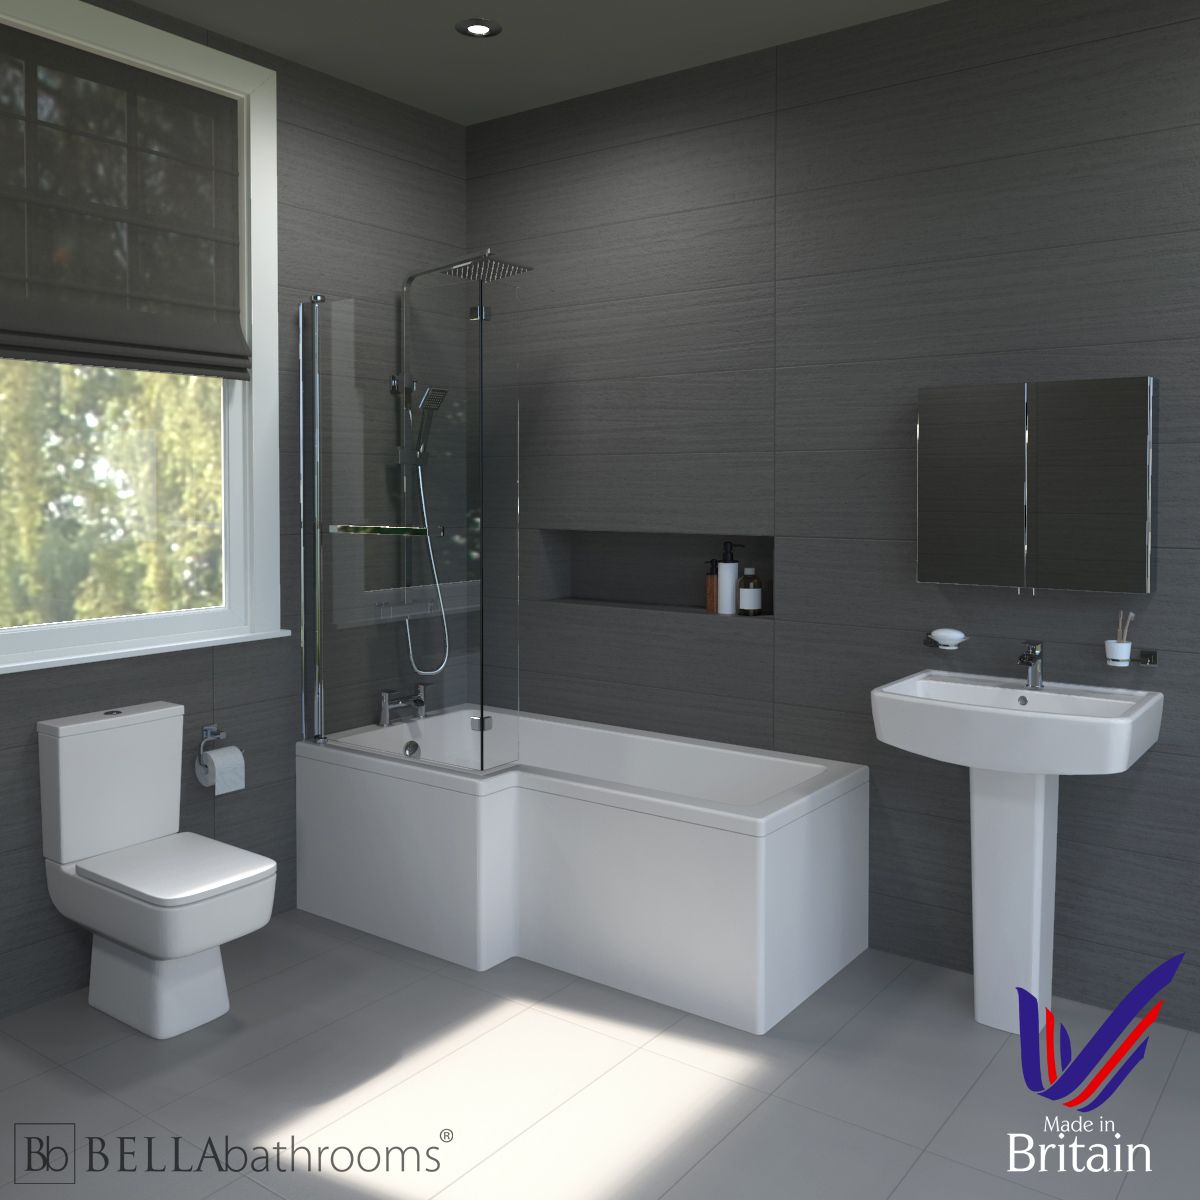 Bliss Left Handed L Shaped Shower Bath Suite